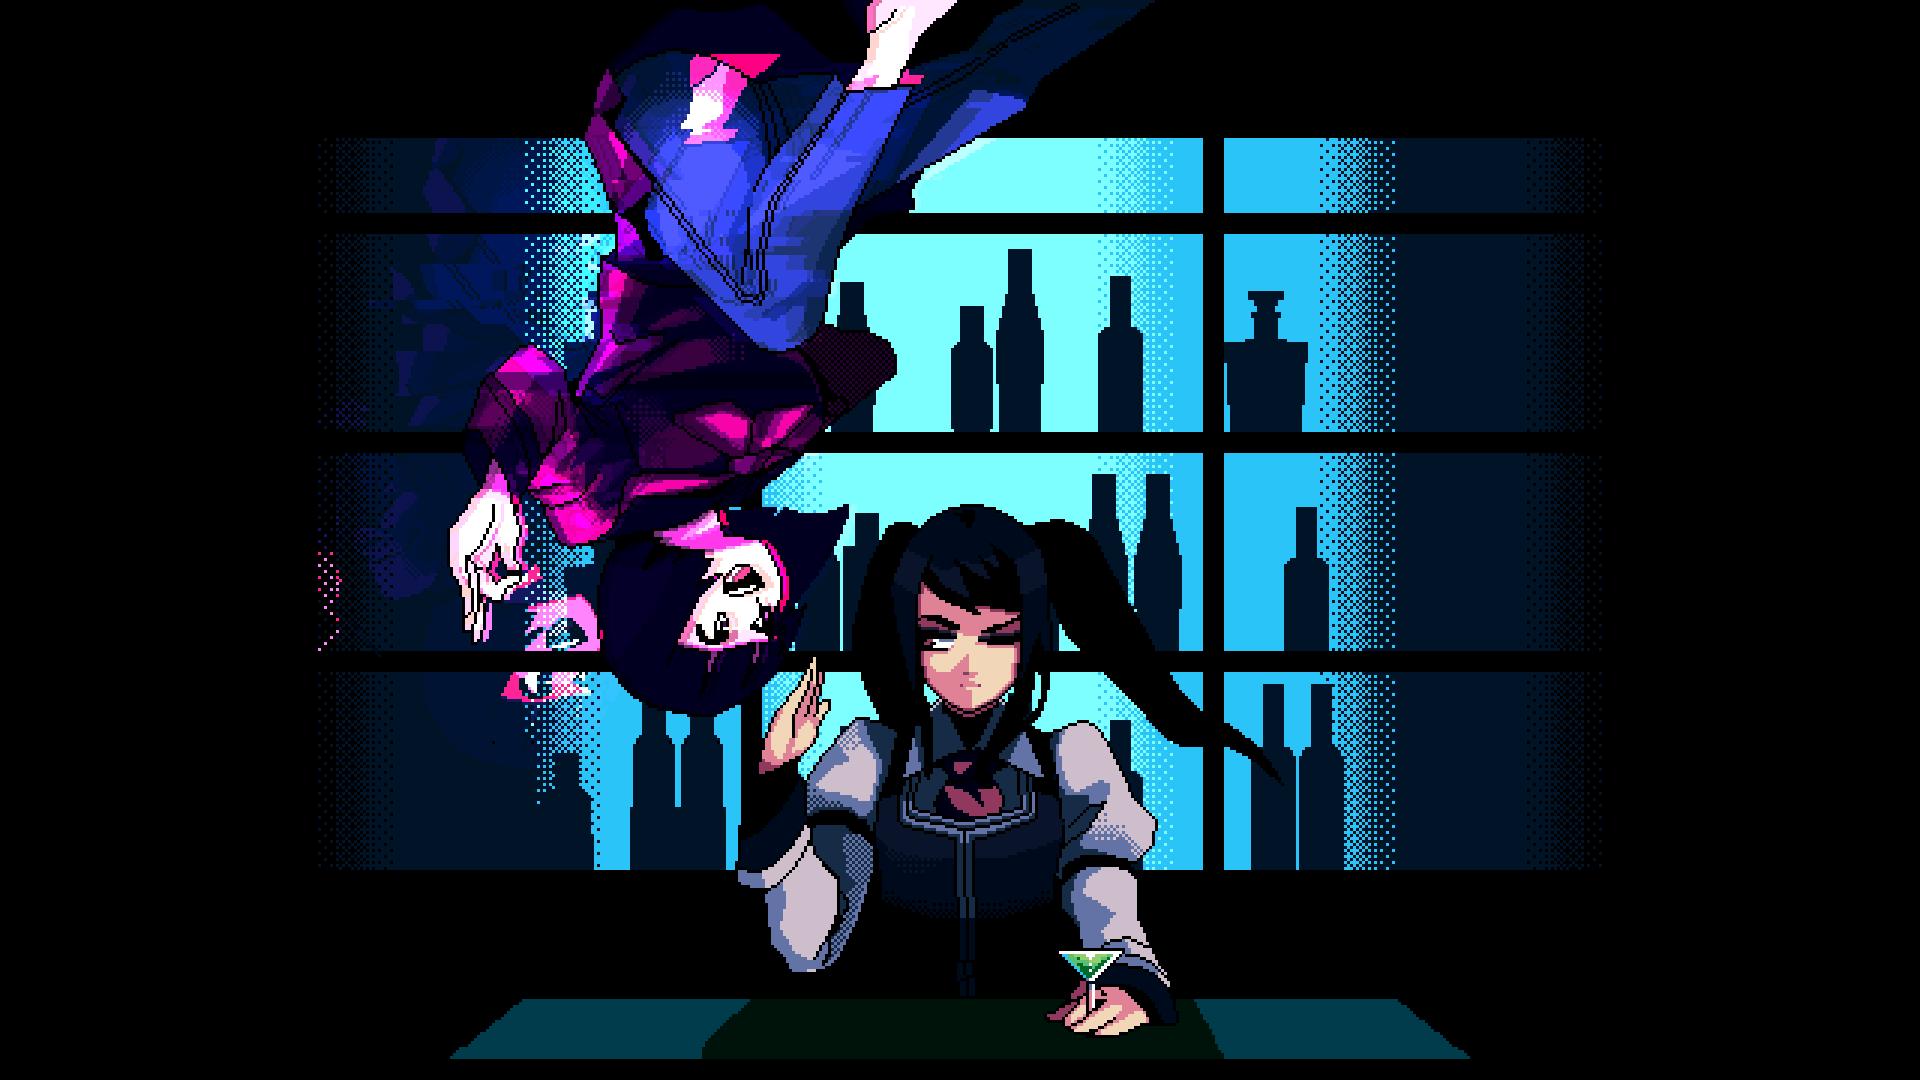 Cyberpunk bartending adventure VA-11 Hall-A hits PS4 today